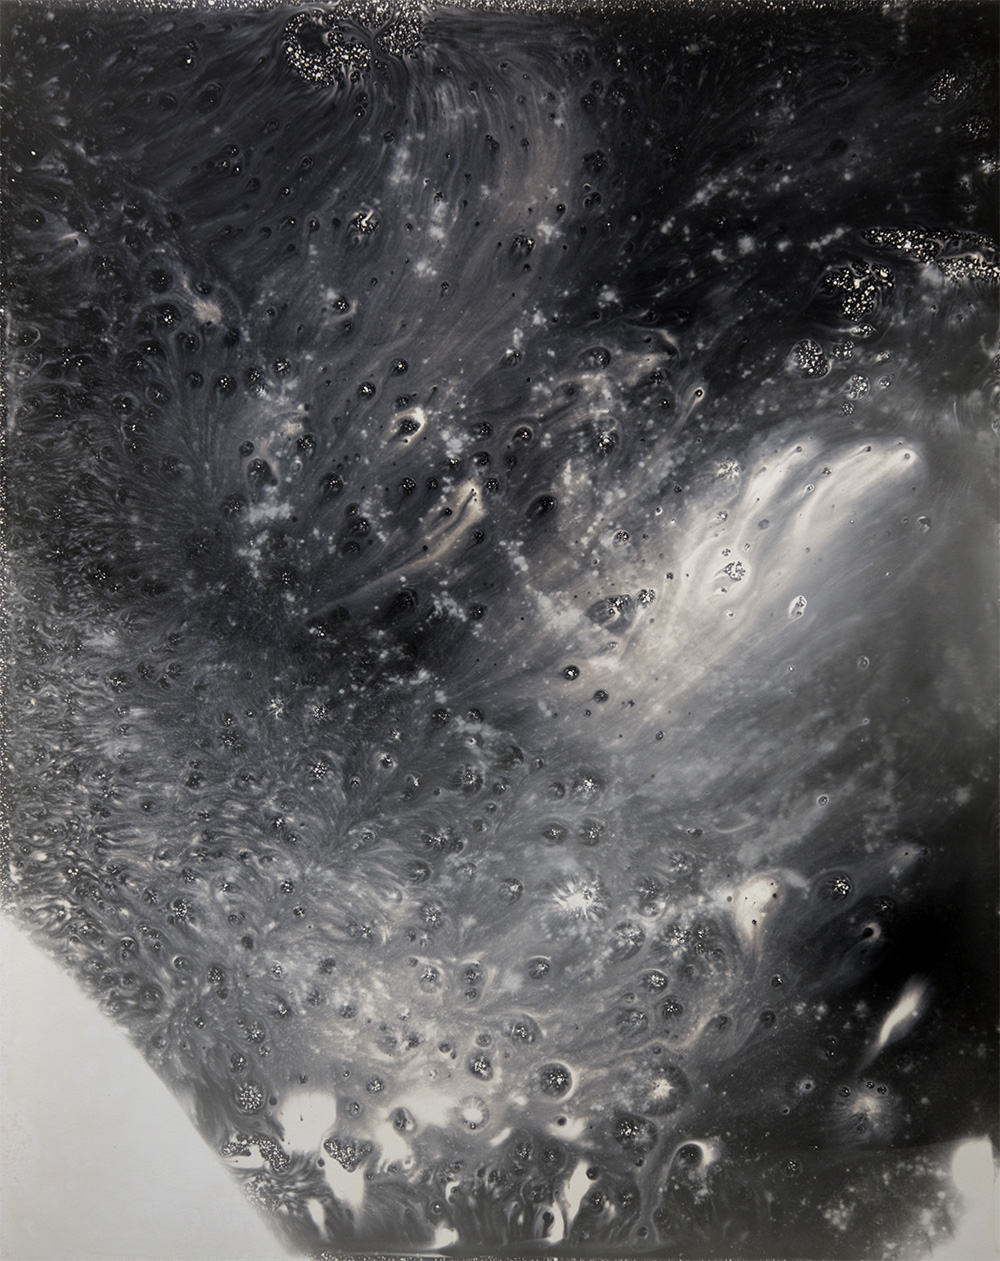 "Night floe , Gelatin silver print, 20x16"", 2016"